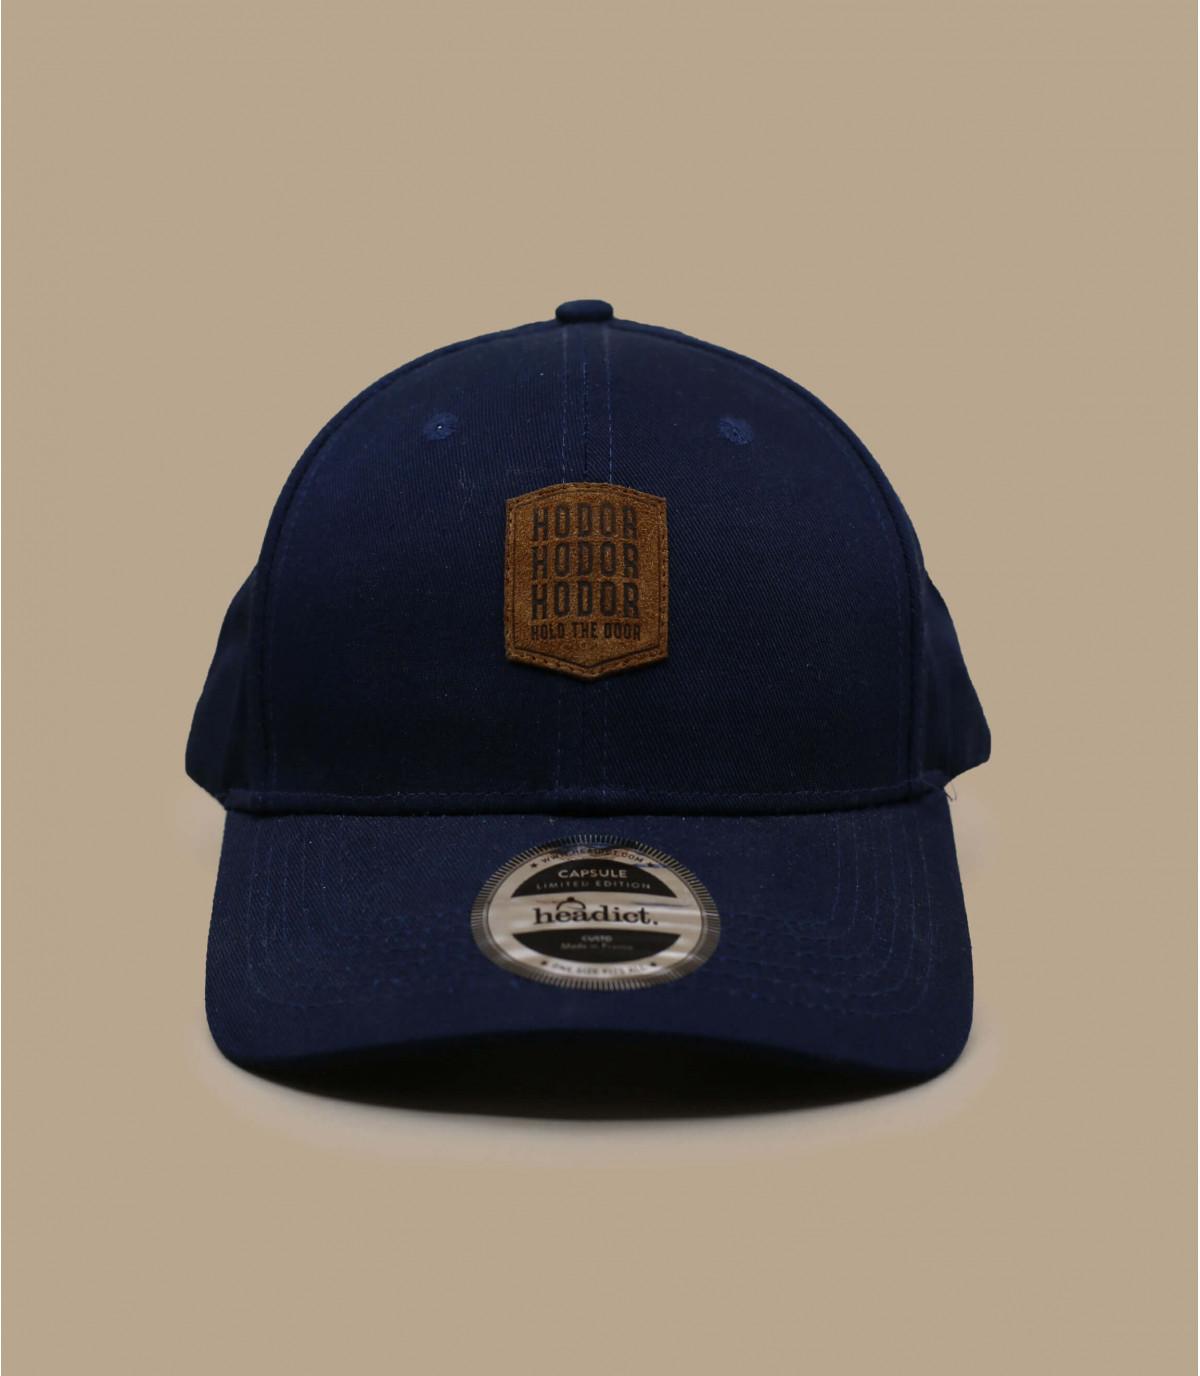 cap blue curve Hodor